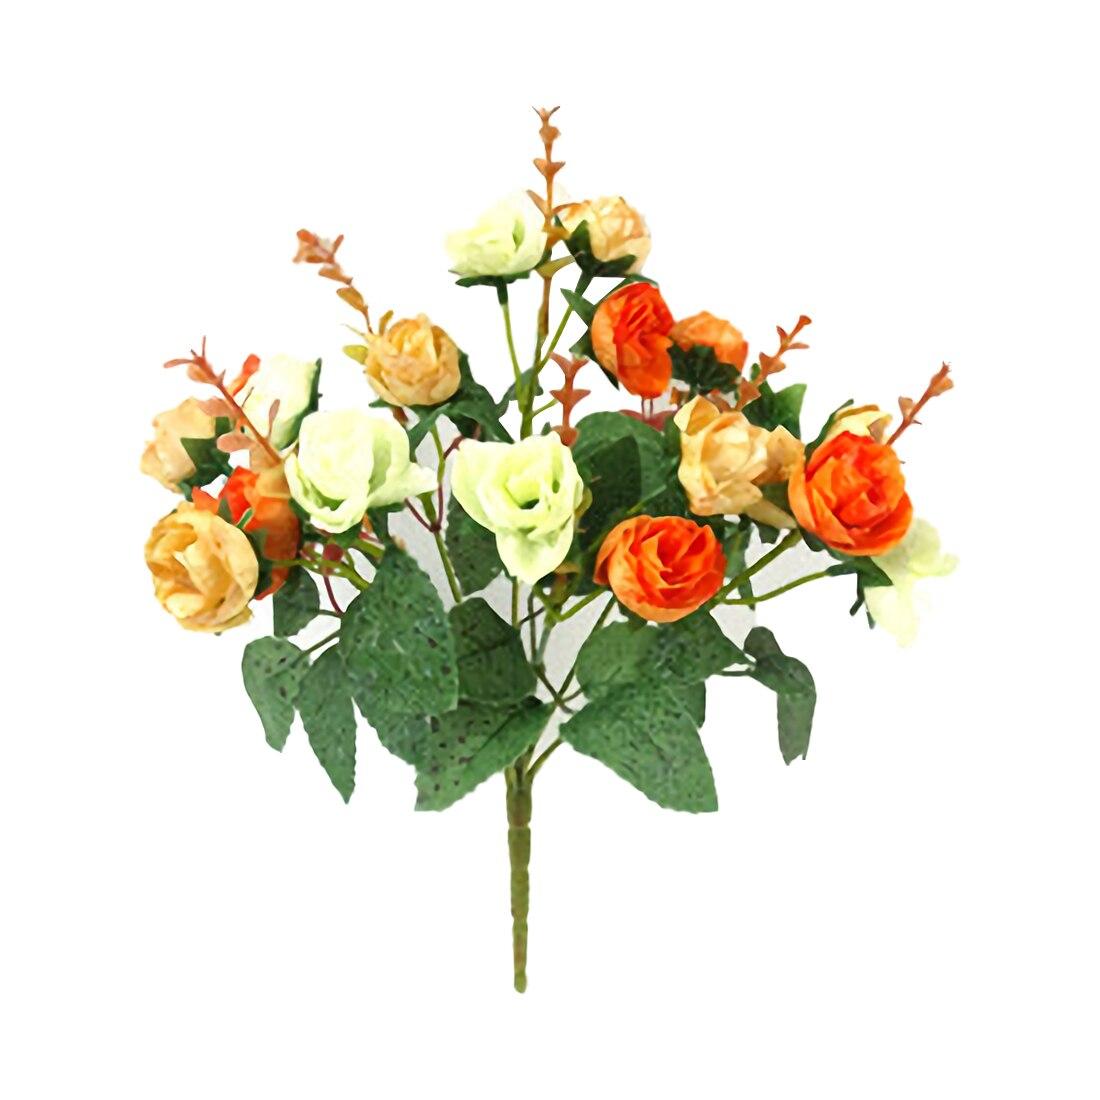 HOT SALE 21 Heads Artificial Silk Cloth Rose Flowers Fake Leaf Wedding Bouquet Home Decoration, Orange